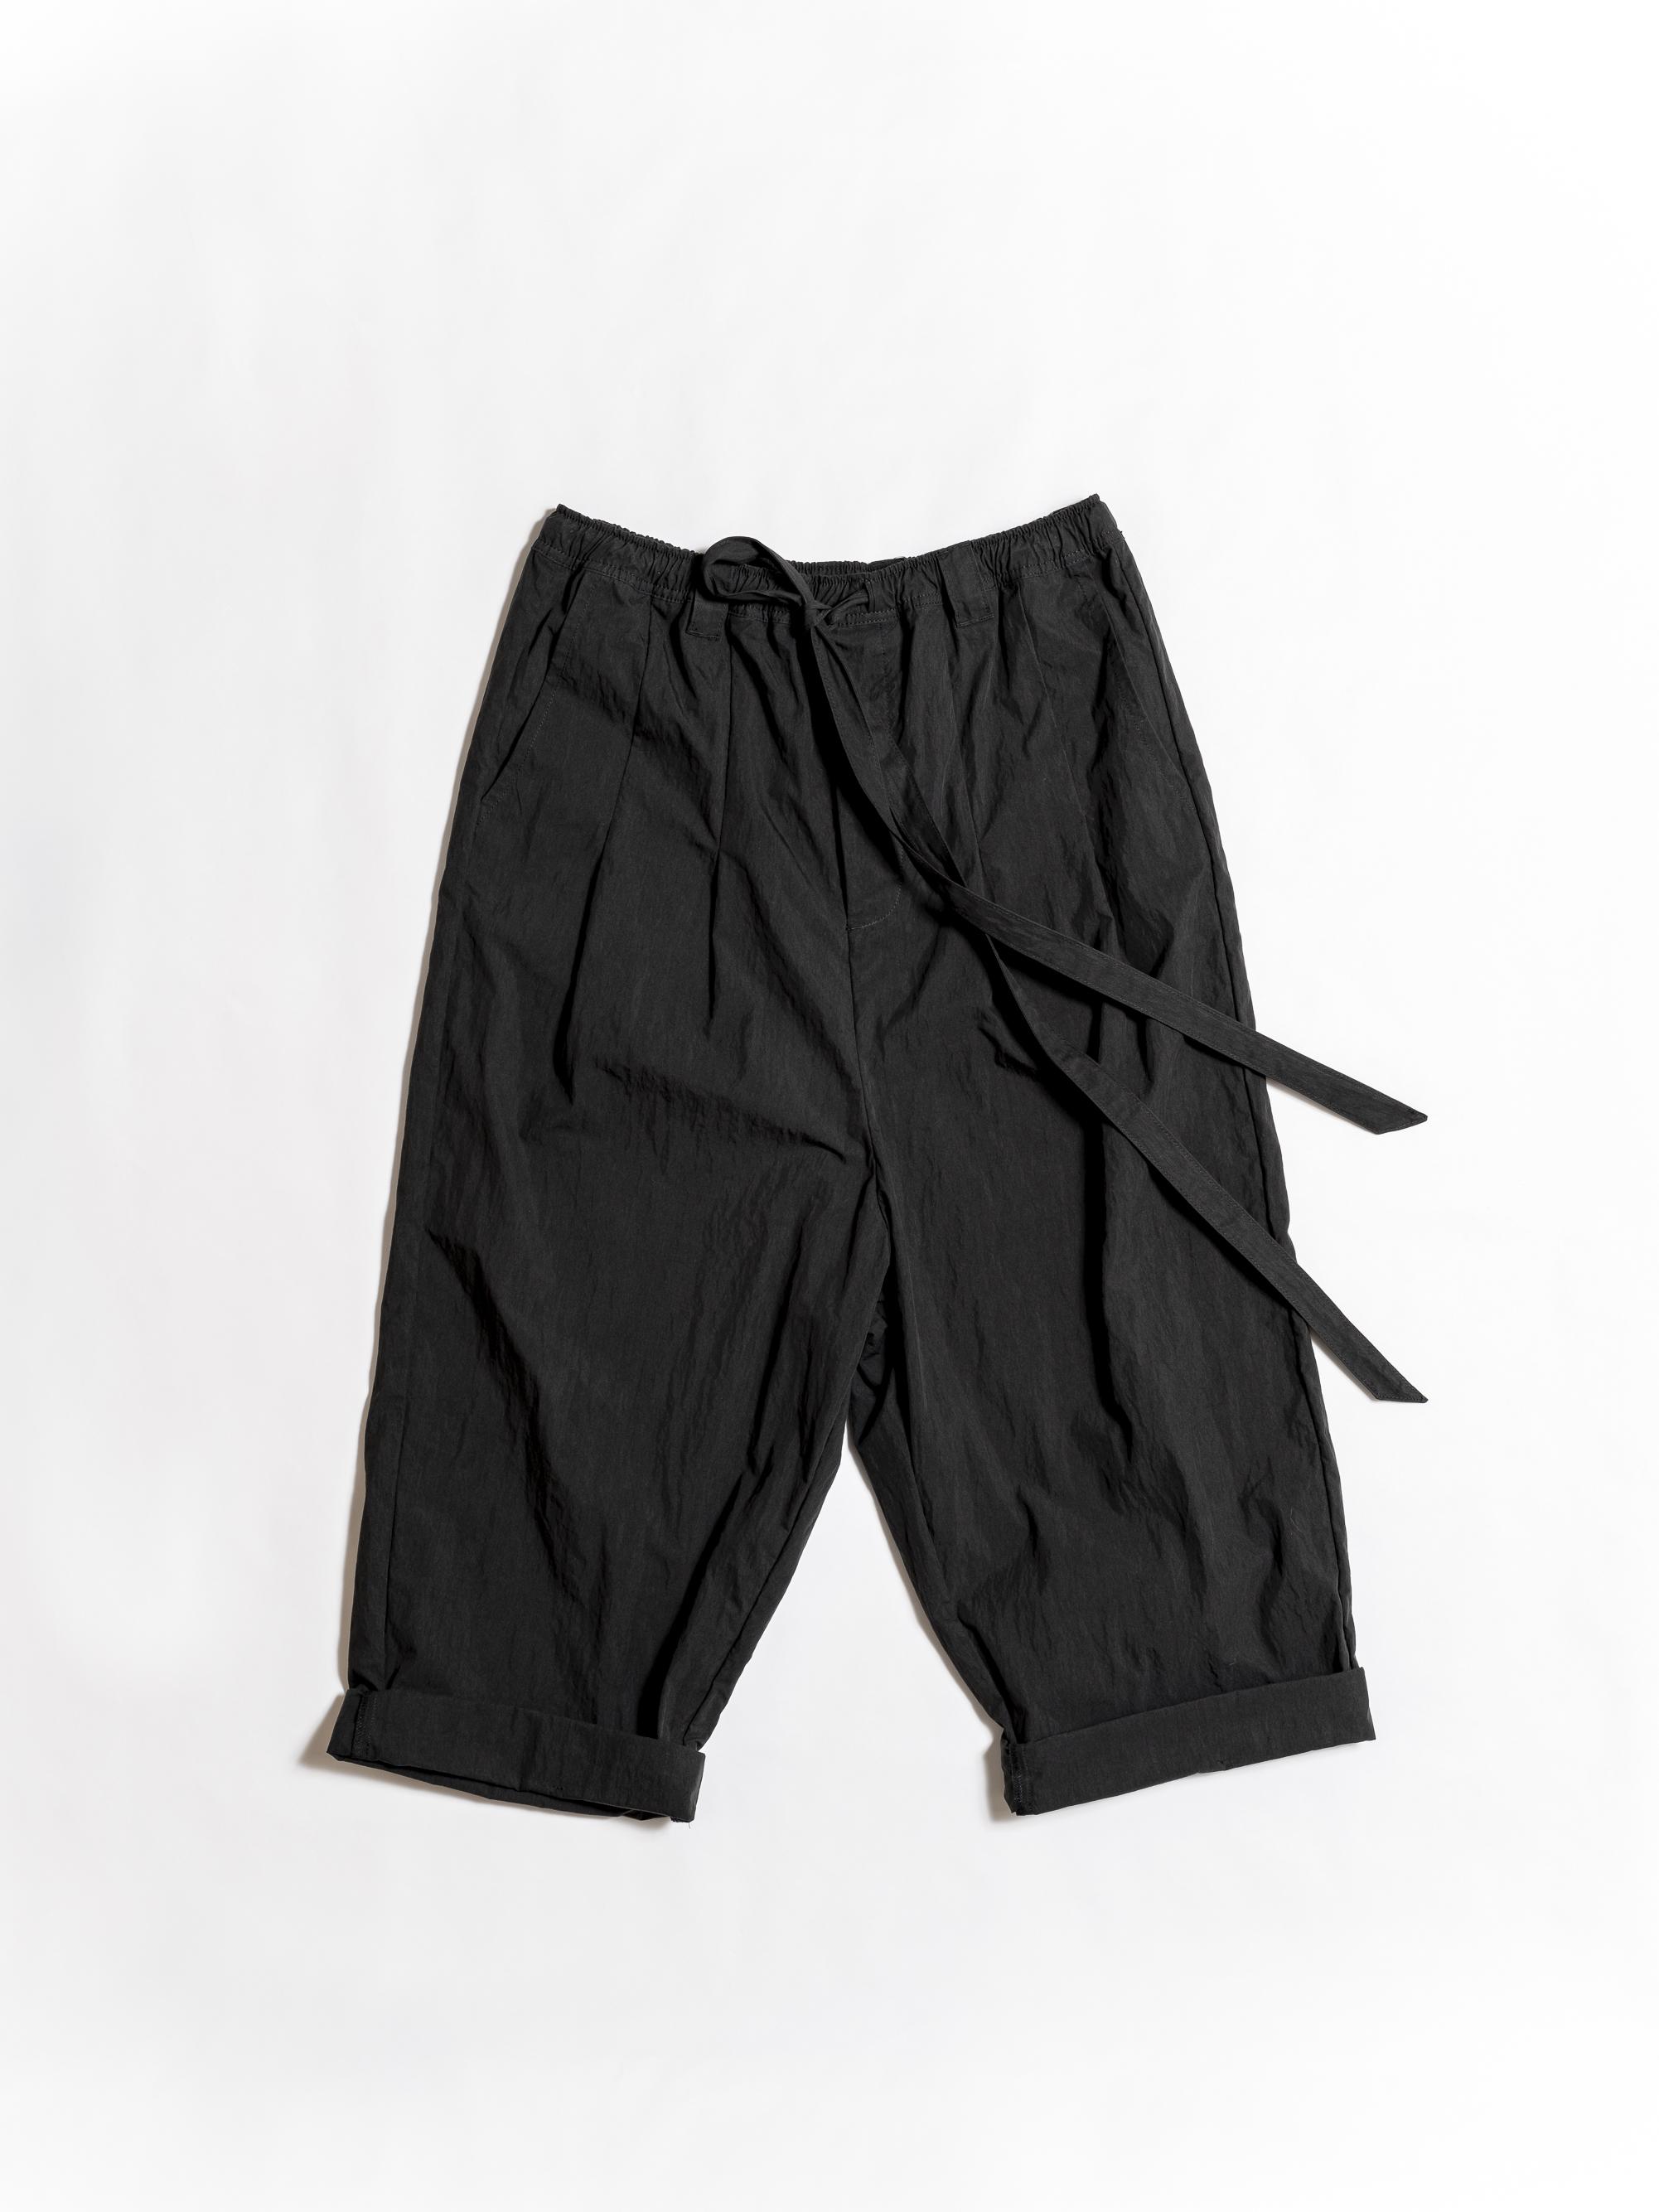 Taichi Cotton Nylon Pants - Black